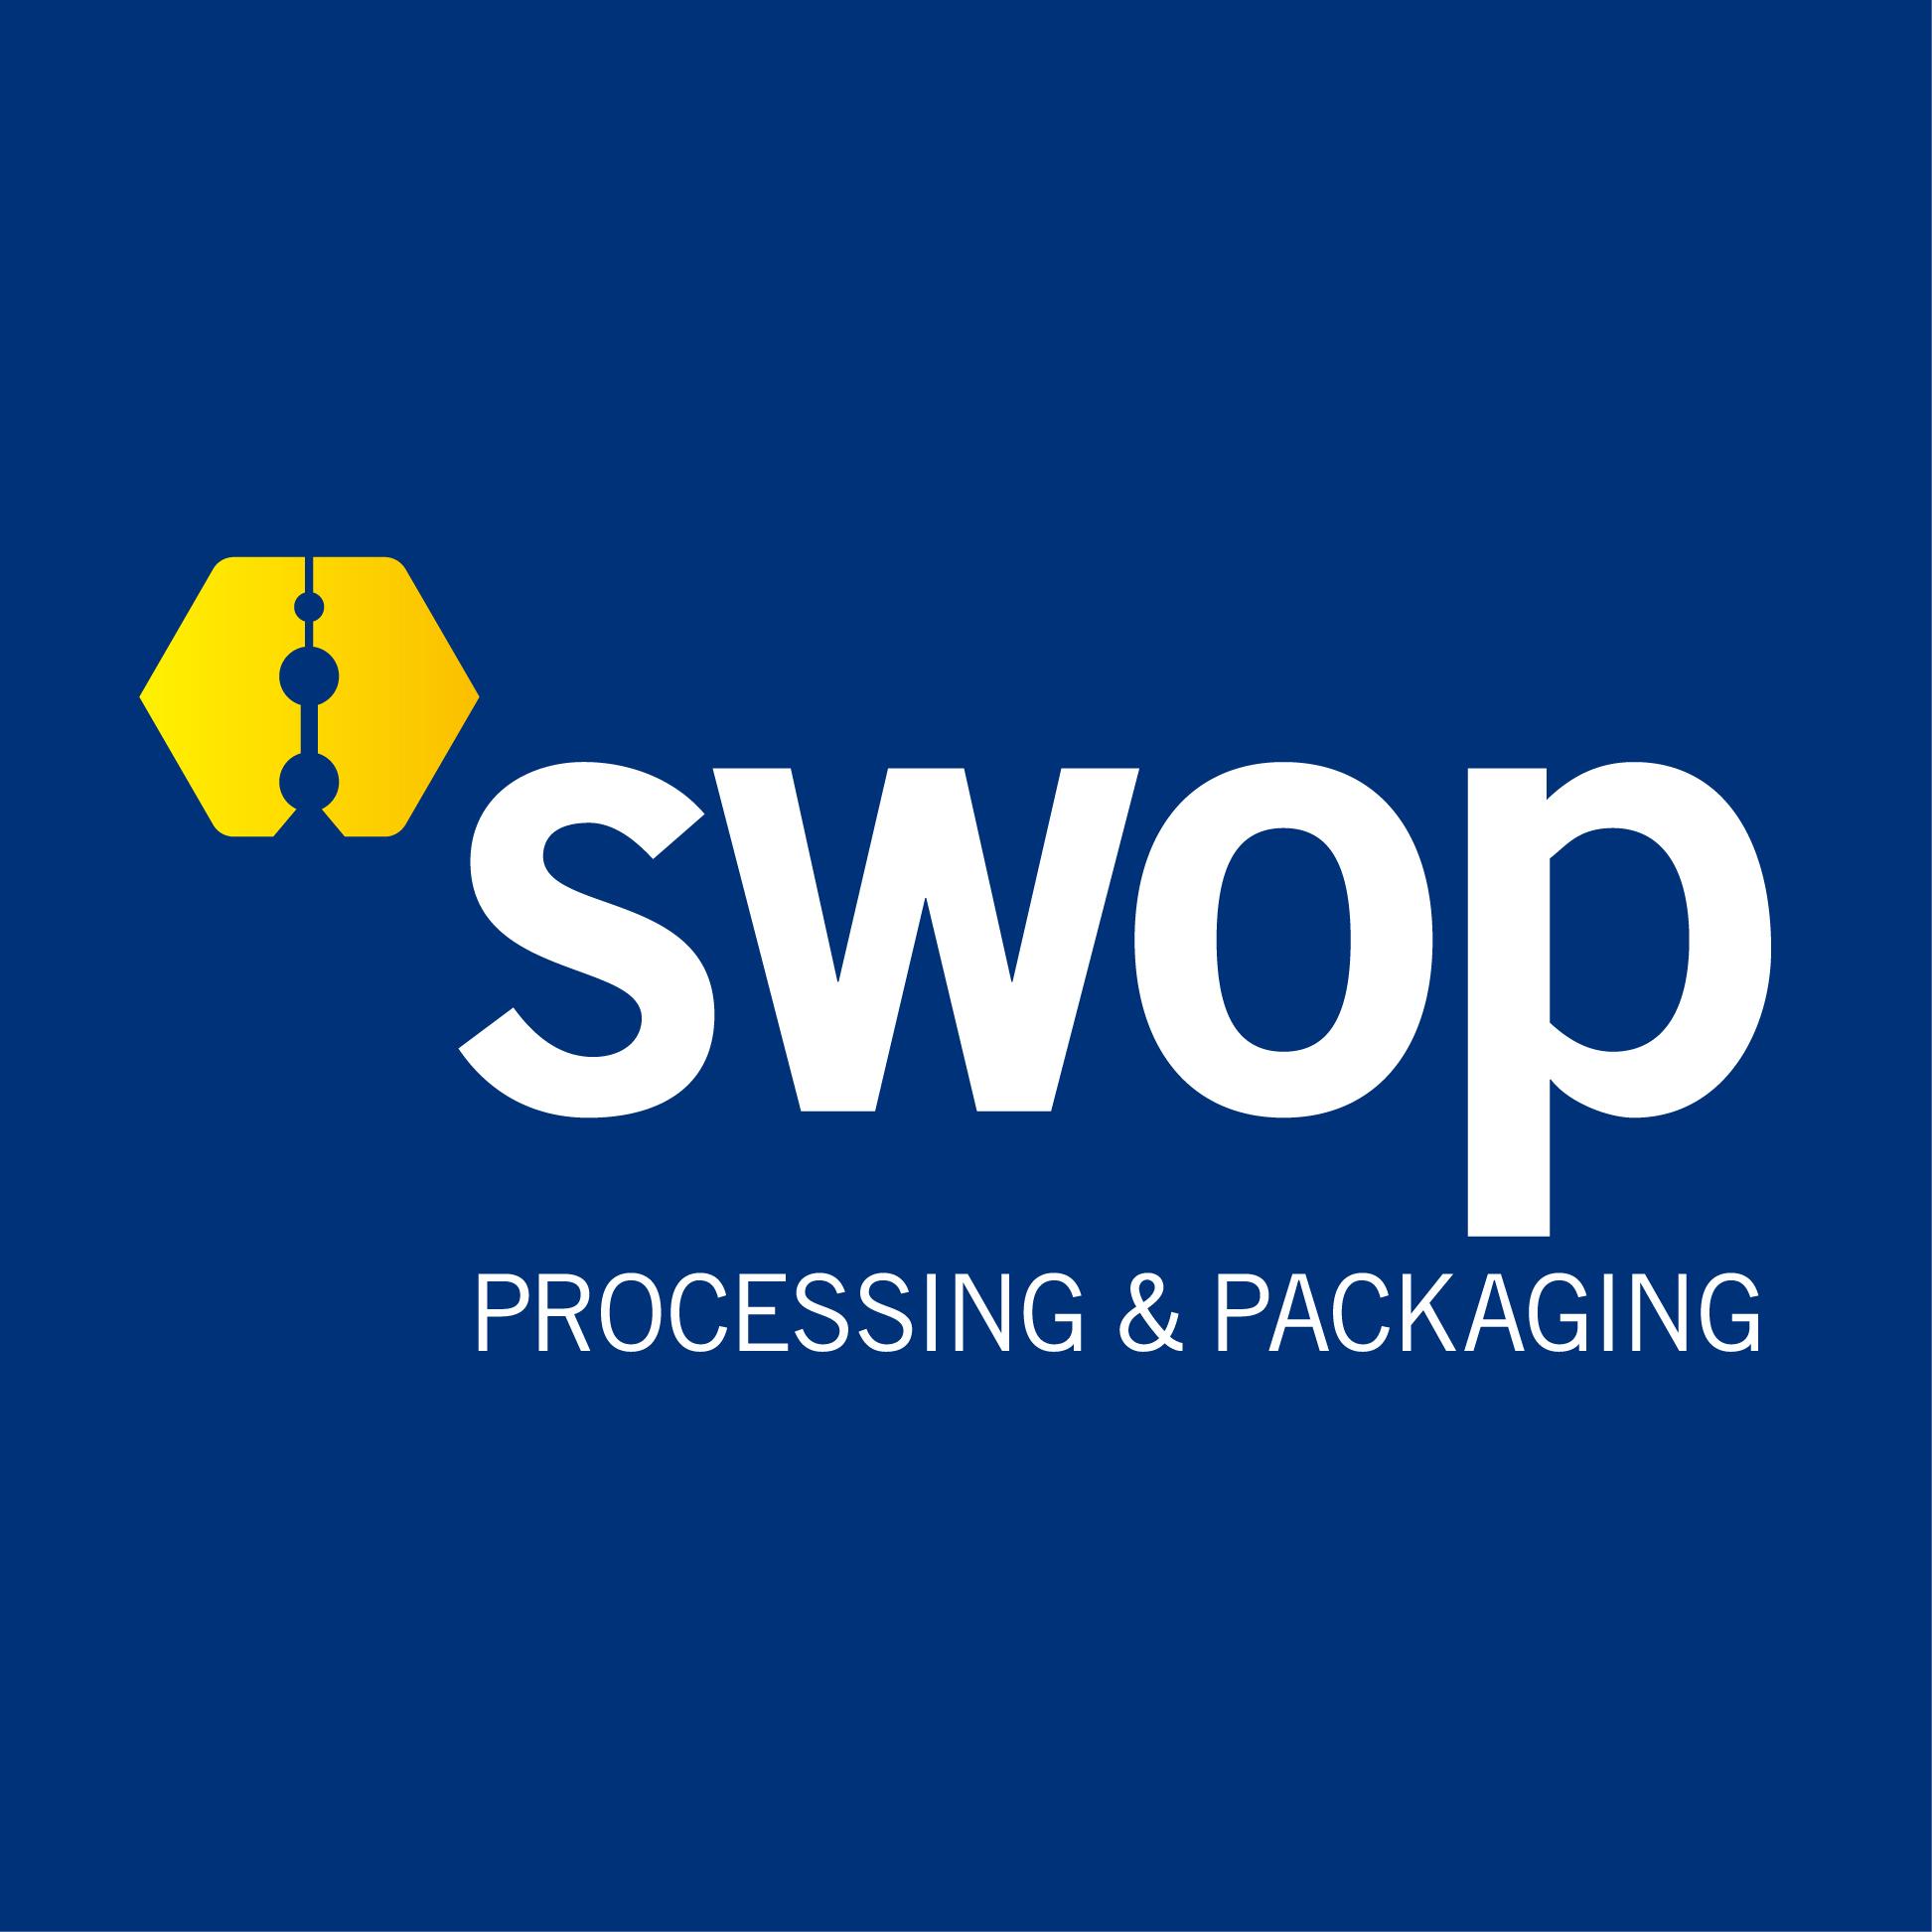 swop 再度提升国际化,加入全球第一大加工与包装展interpack联盟